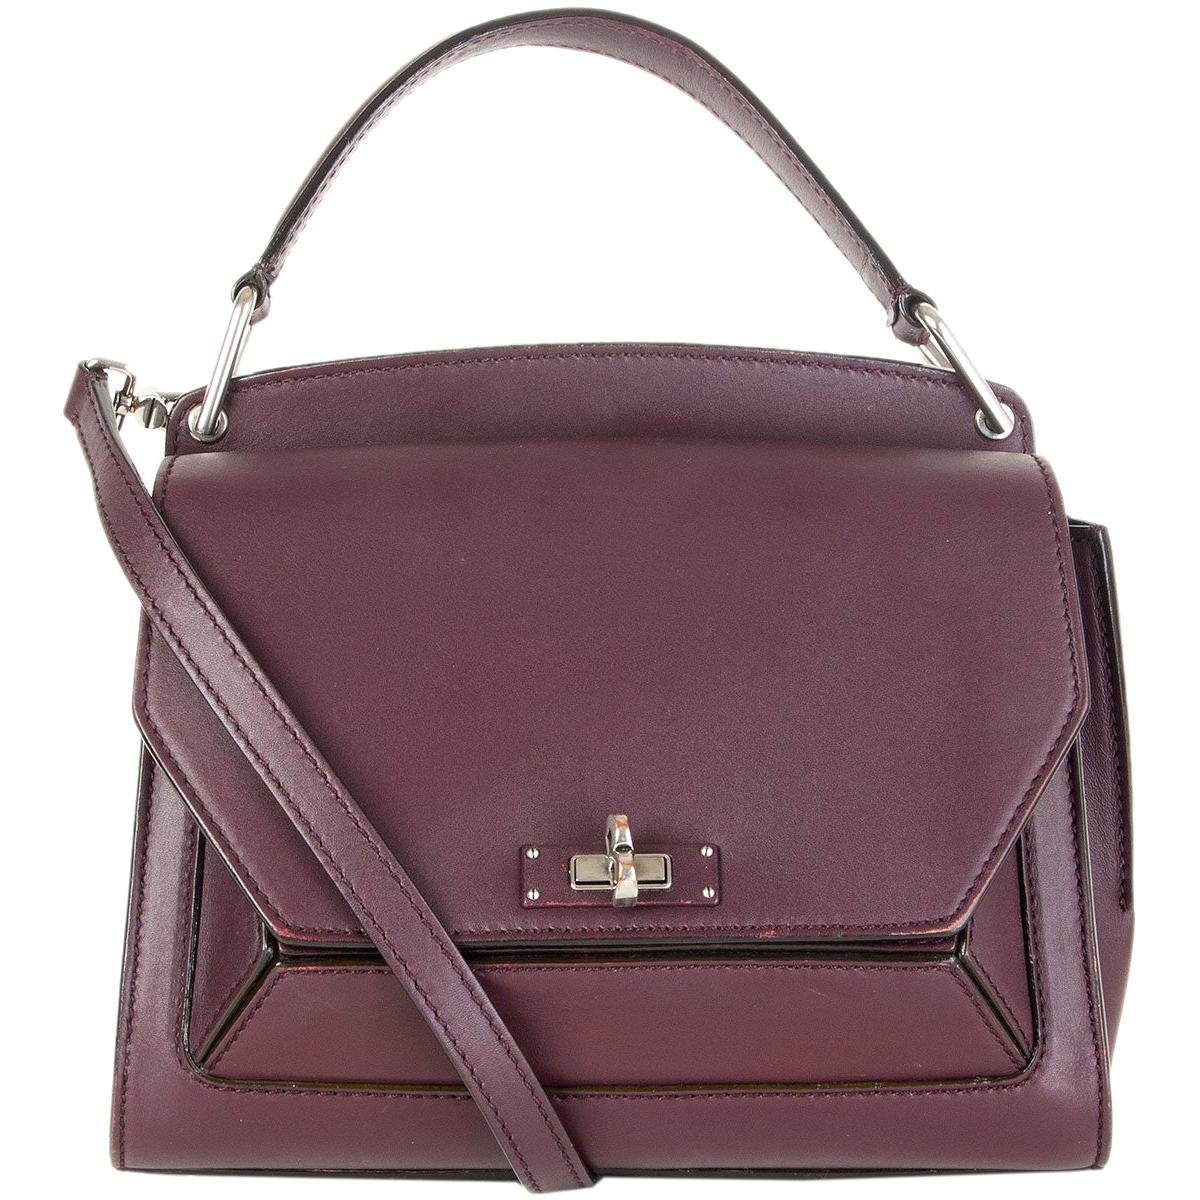 BALLY eggplant purple leather B TURN SATCHEL Shoulder Bag